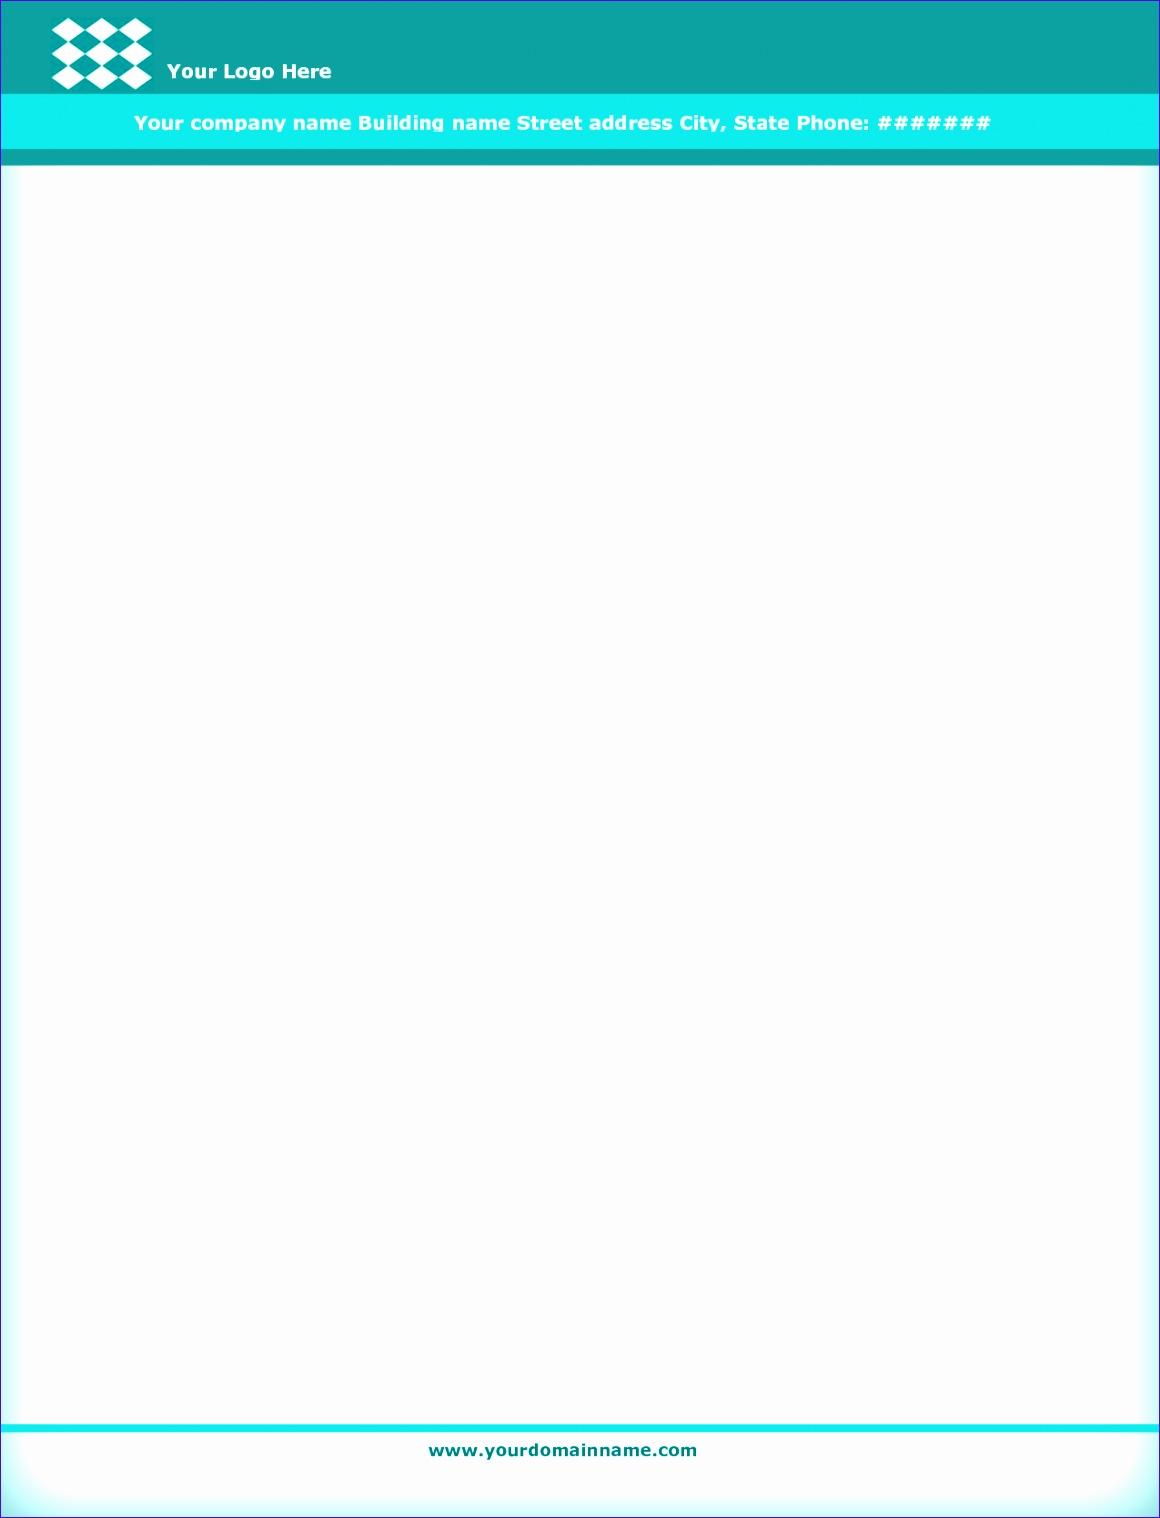 business letterhead templates free 1649 11601518